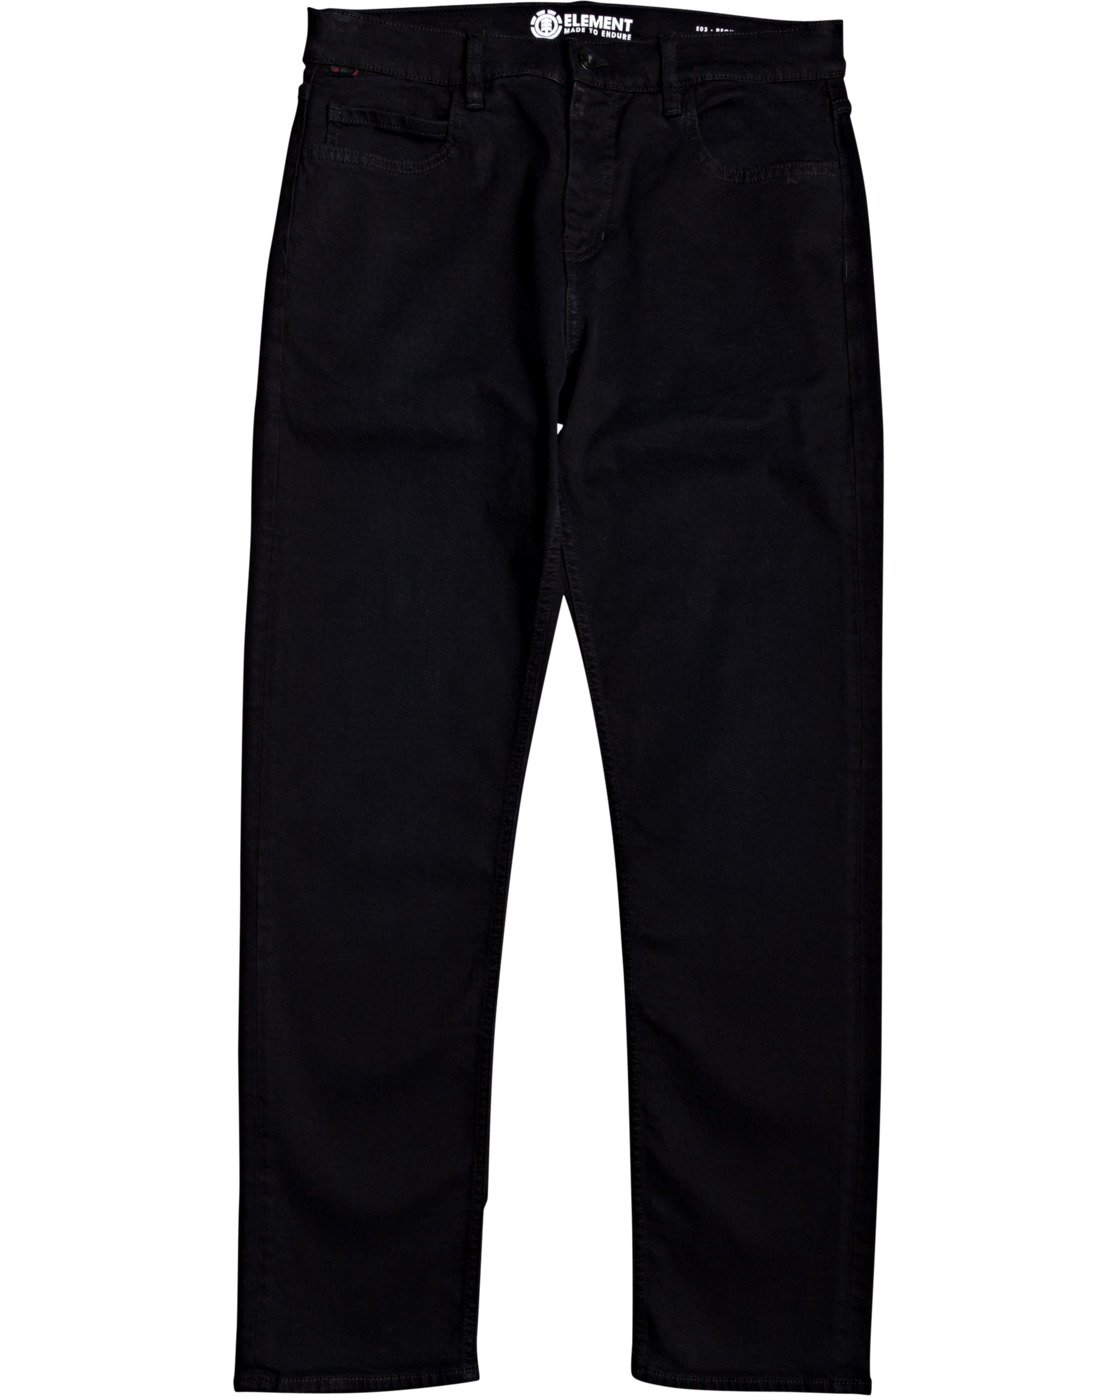 2 E03 Jeans Black M3533E03 Element